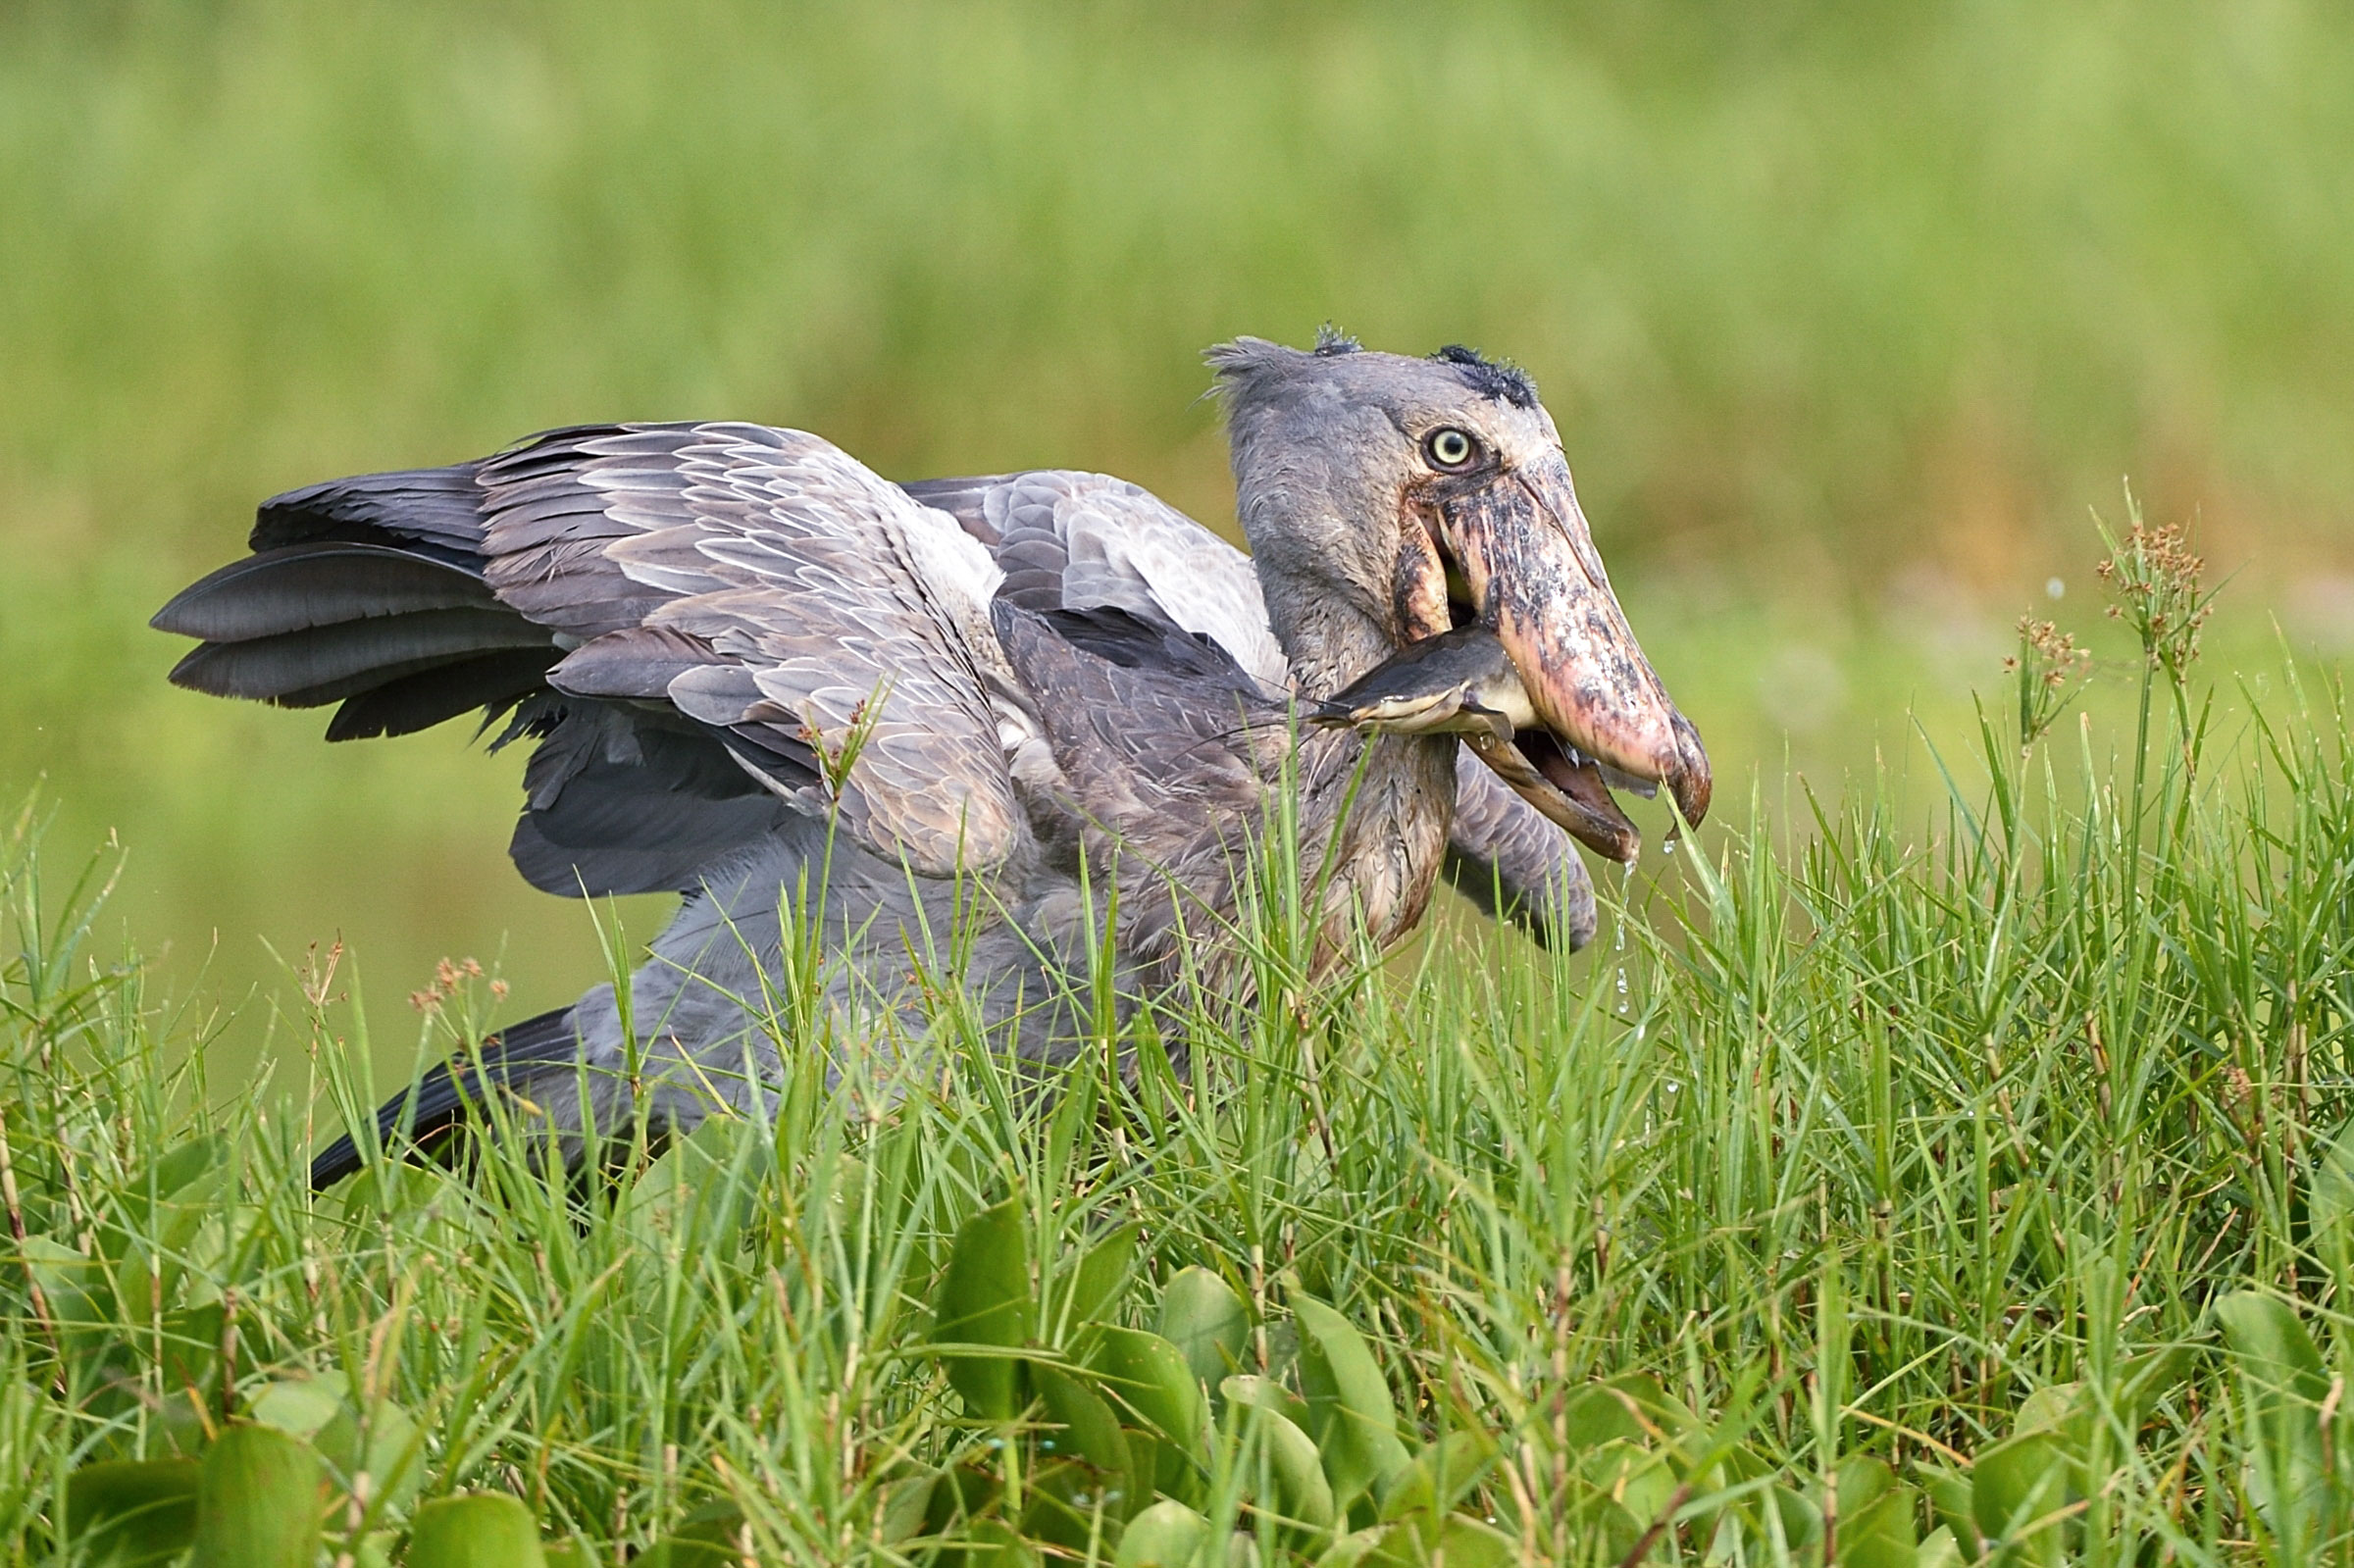 Shoebill (somehow birb). John Rollins/Audubon Photography Awards